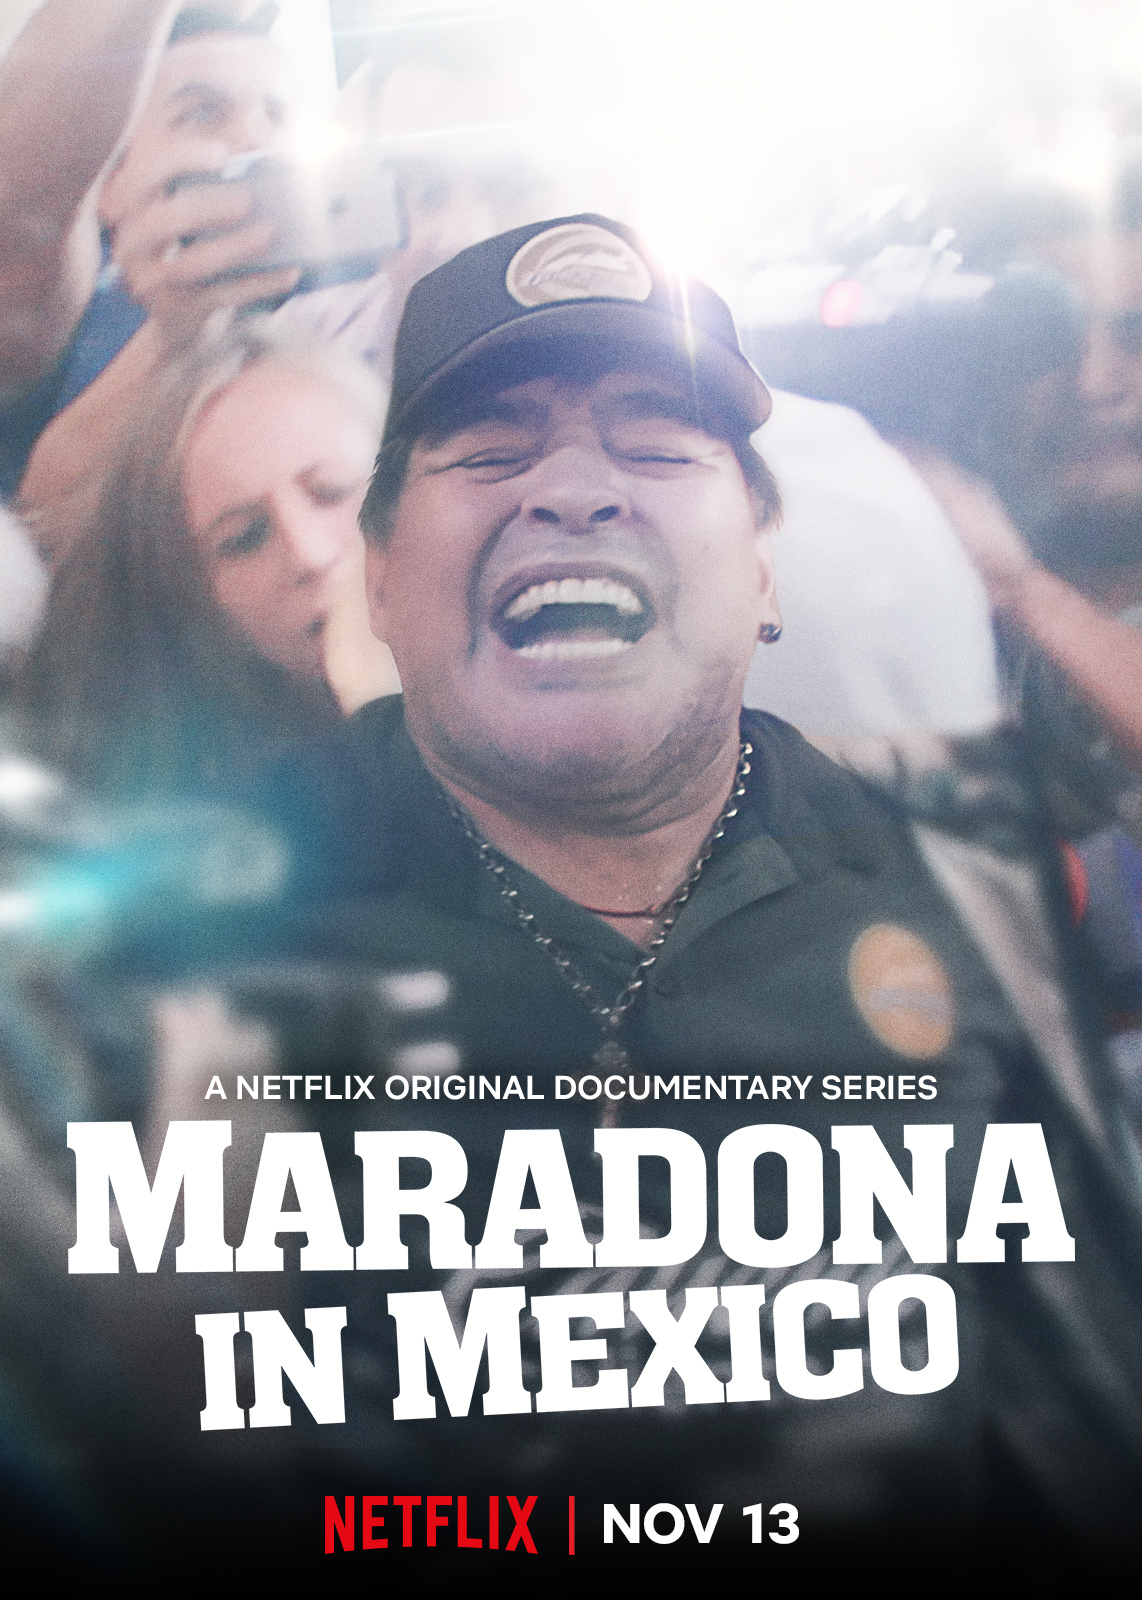 MaradonainMexico